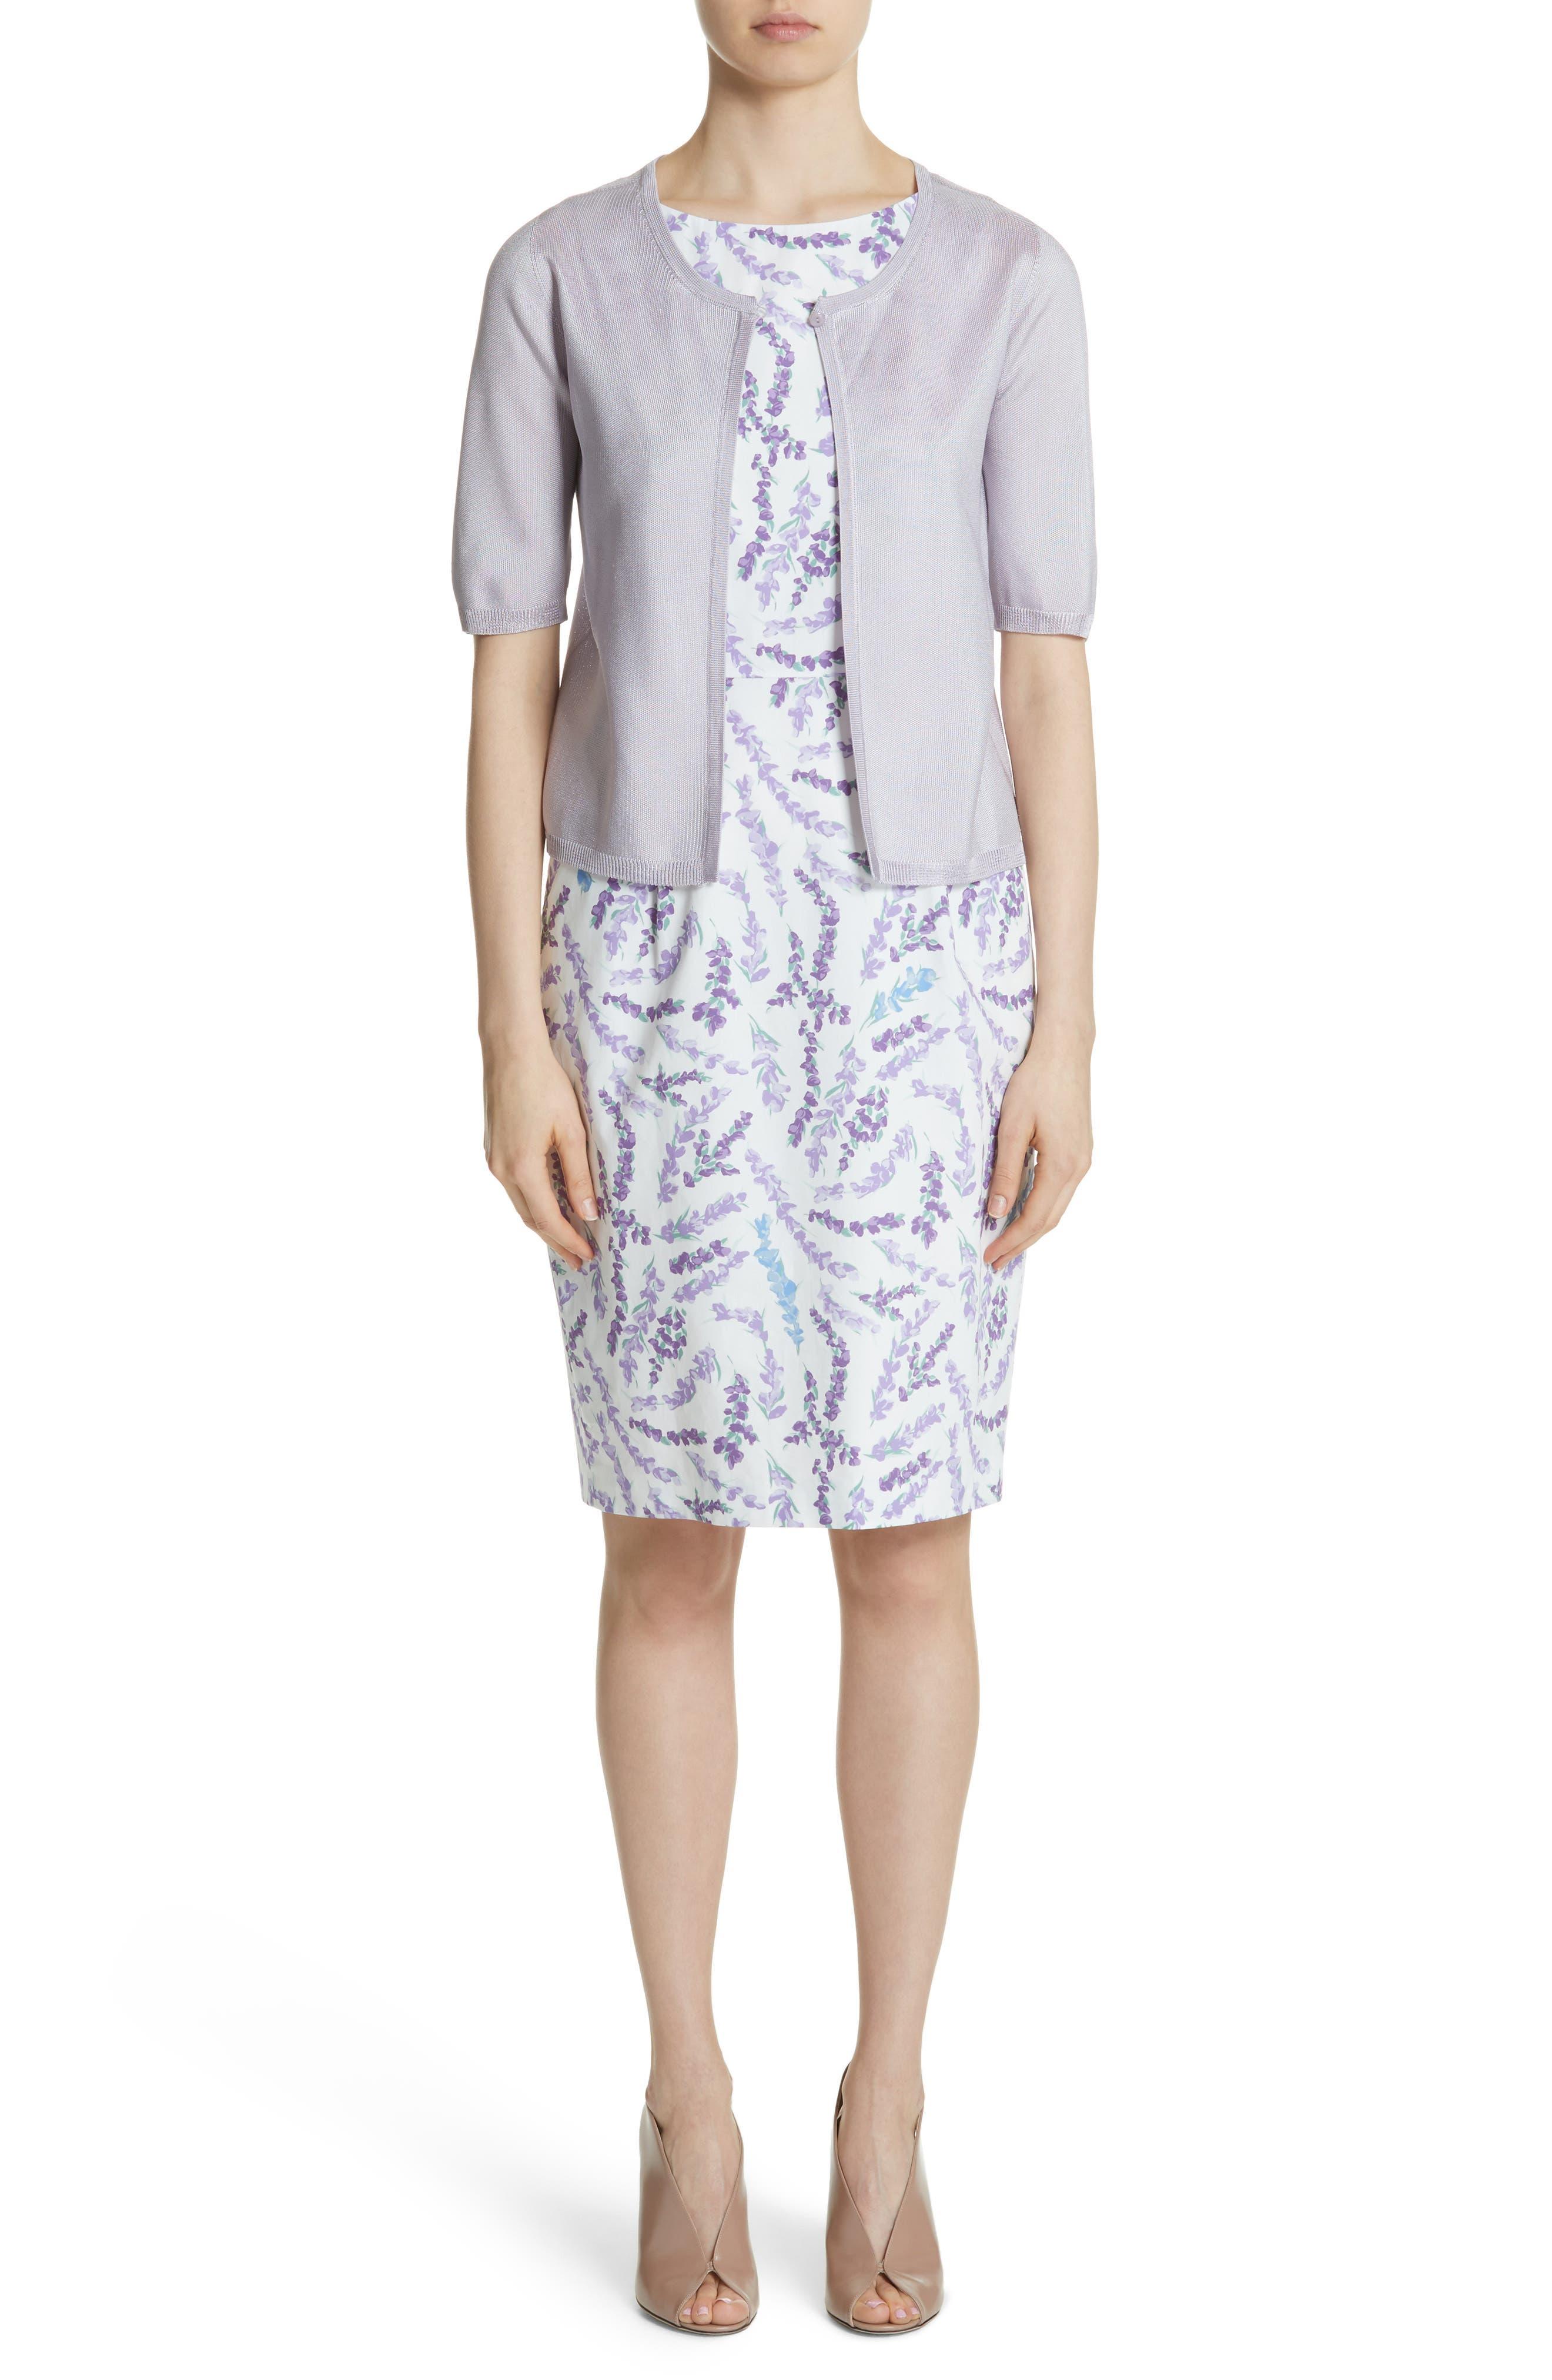 Melfi Print Cotton Sheath Dress,                             Alternate thumbnail 8, color,                             Lavender